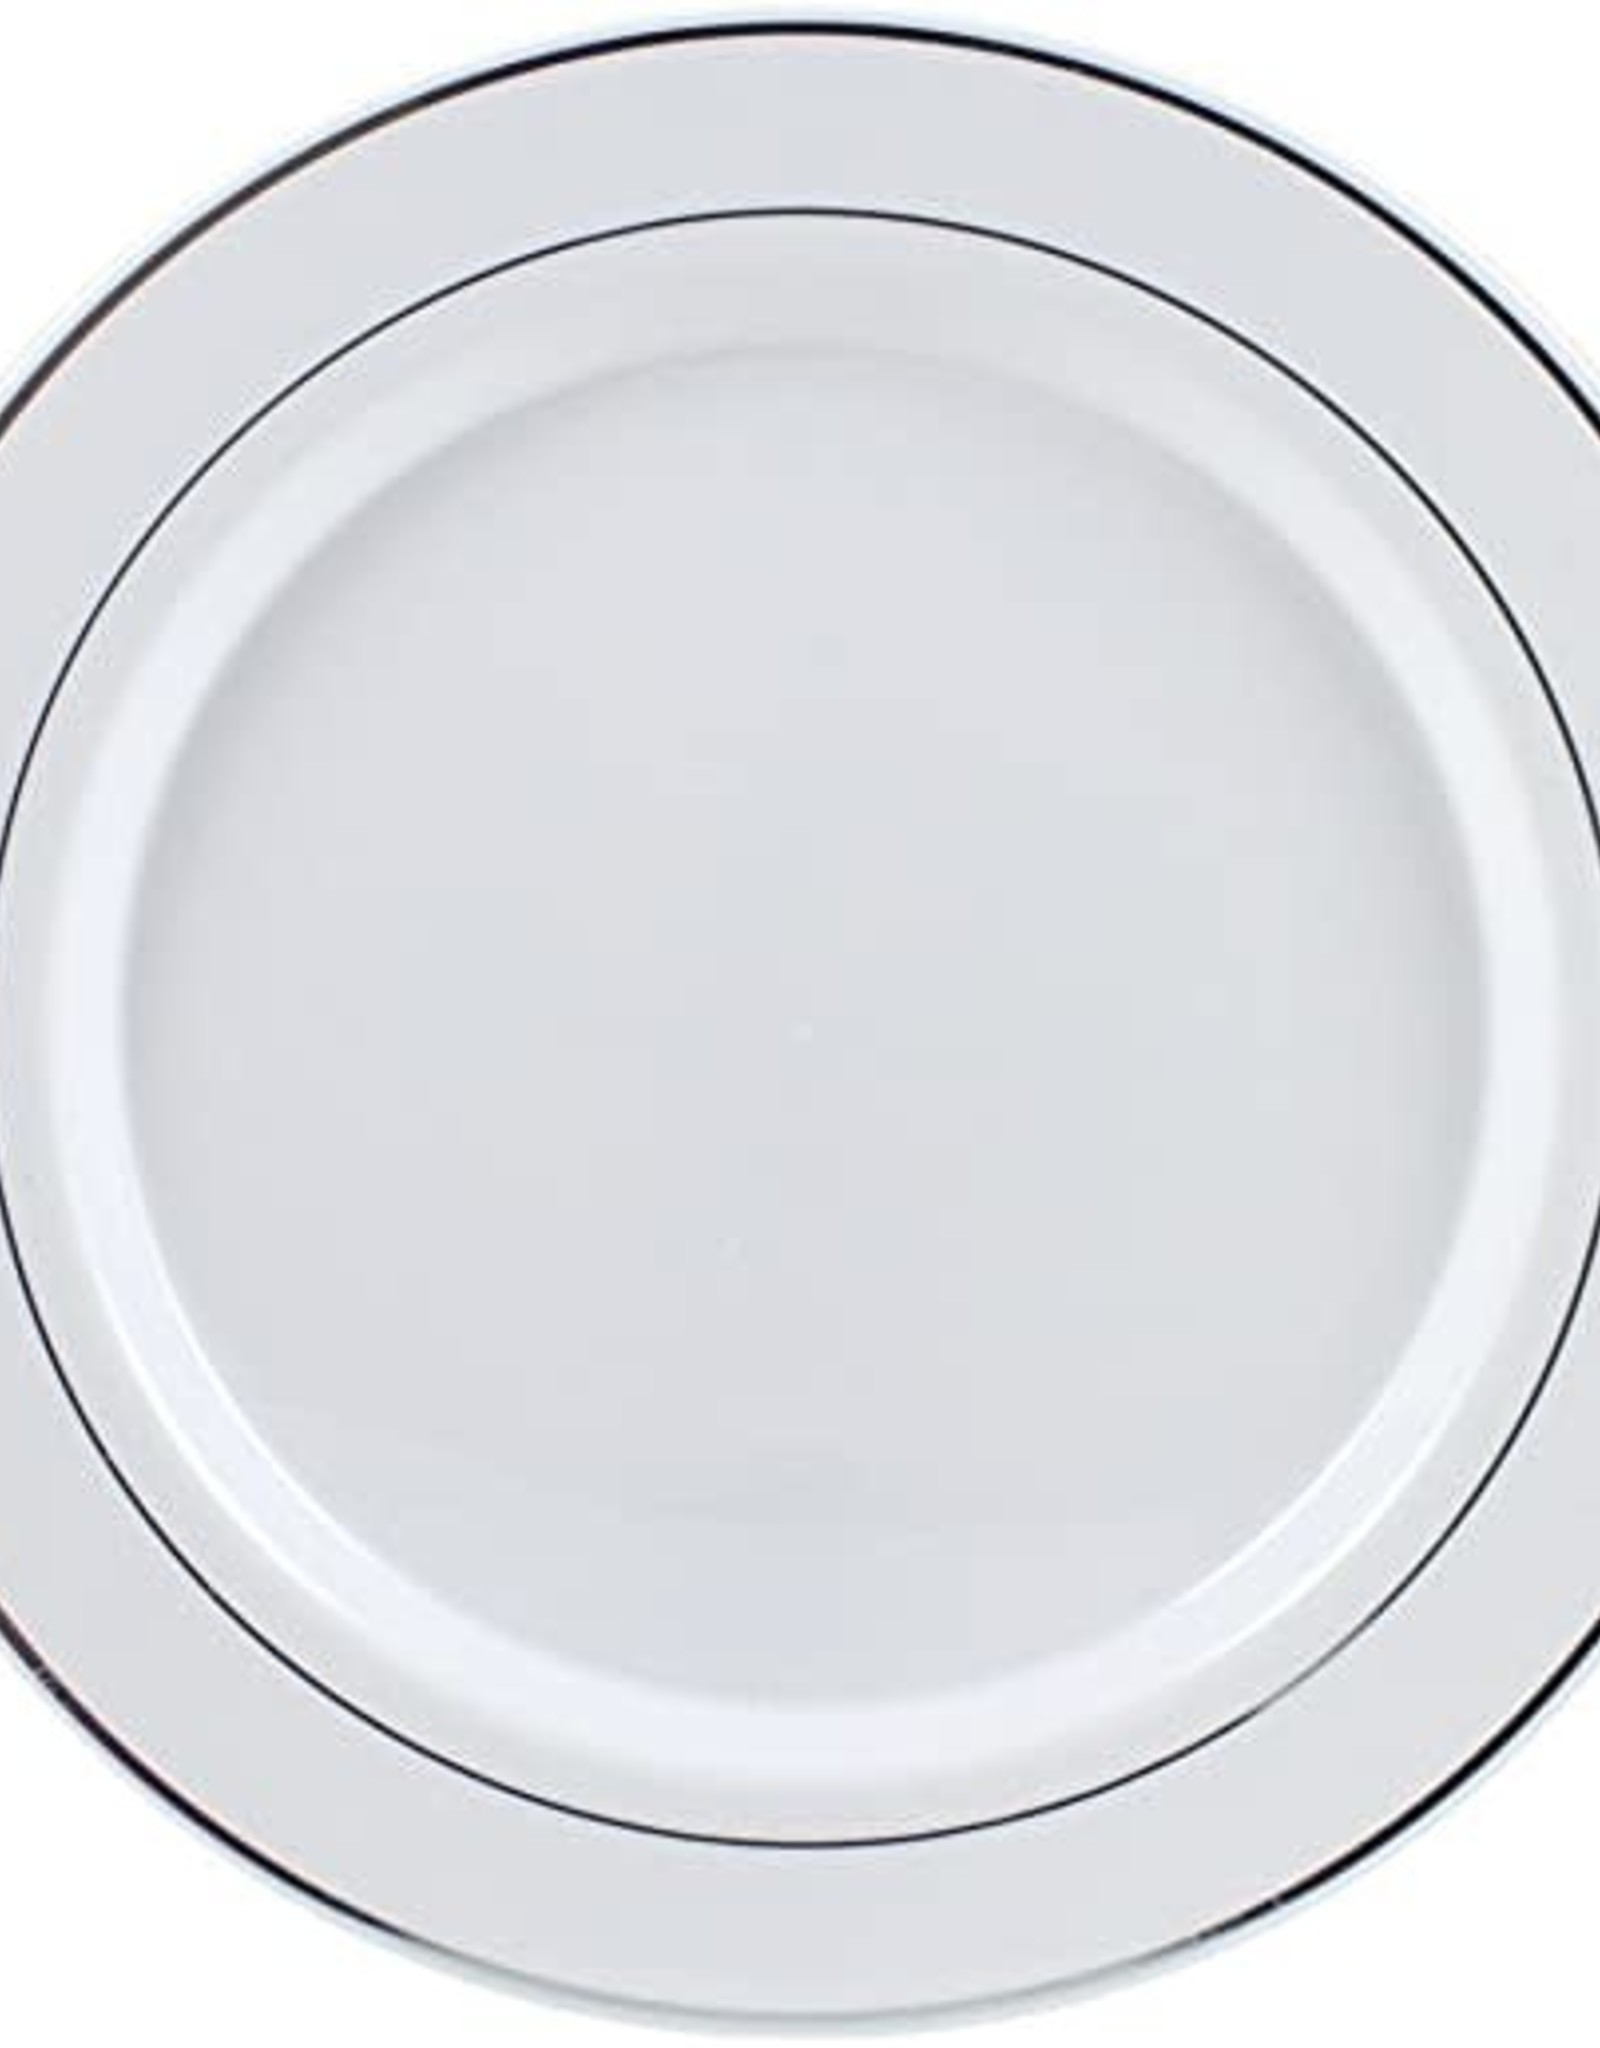 "7 1/2"" plastic plates 10 count"